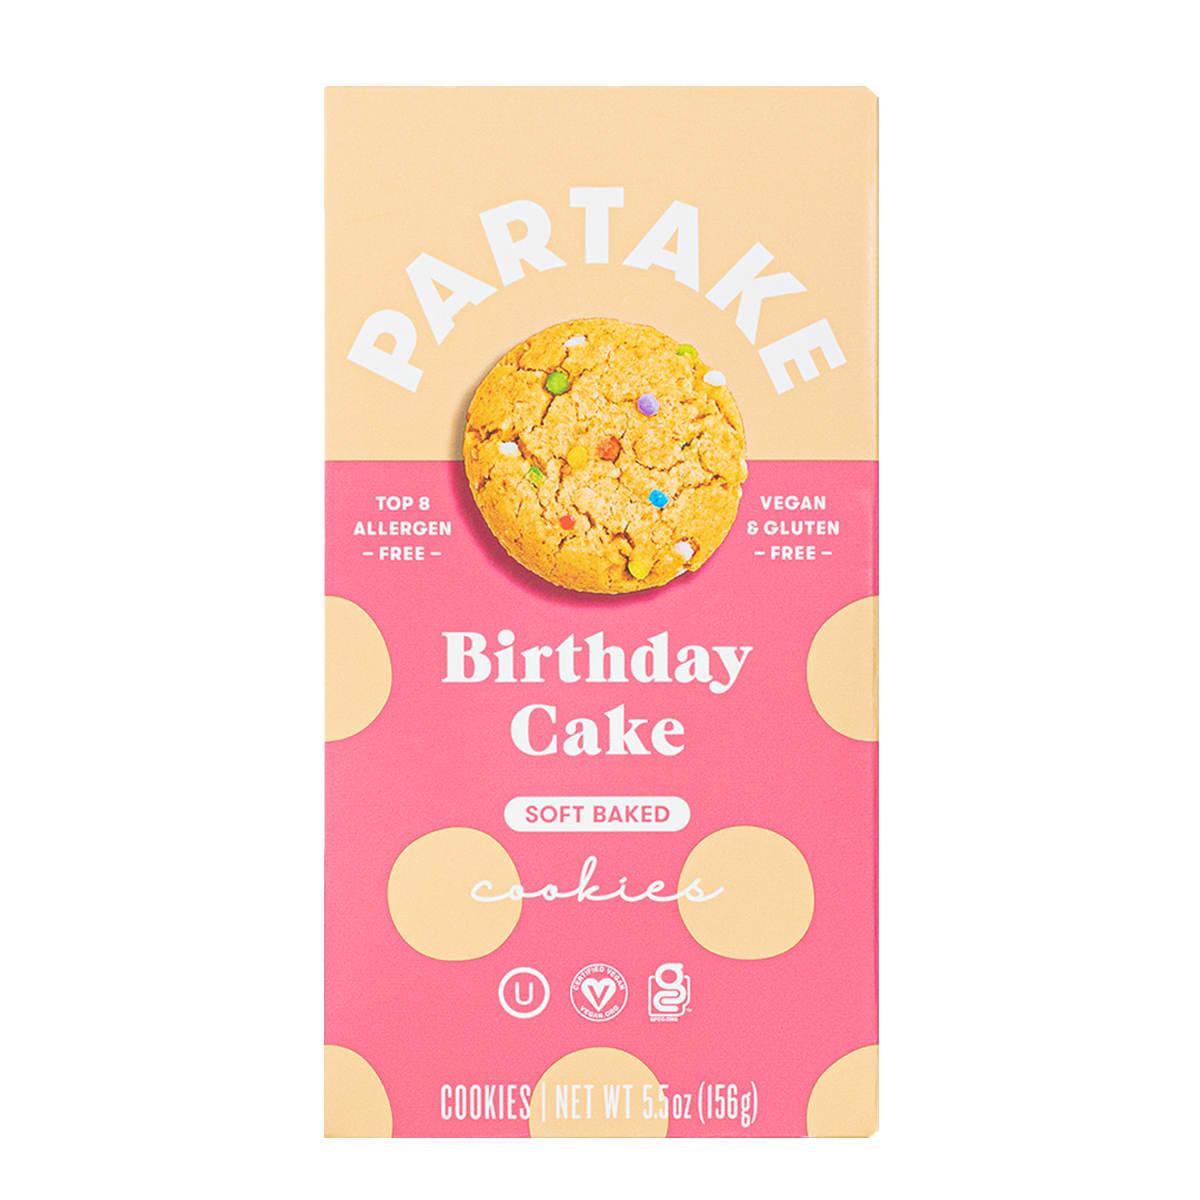 Partake Birthday Cake Soft Baked Cookies, front of bag, vegan, gluten free